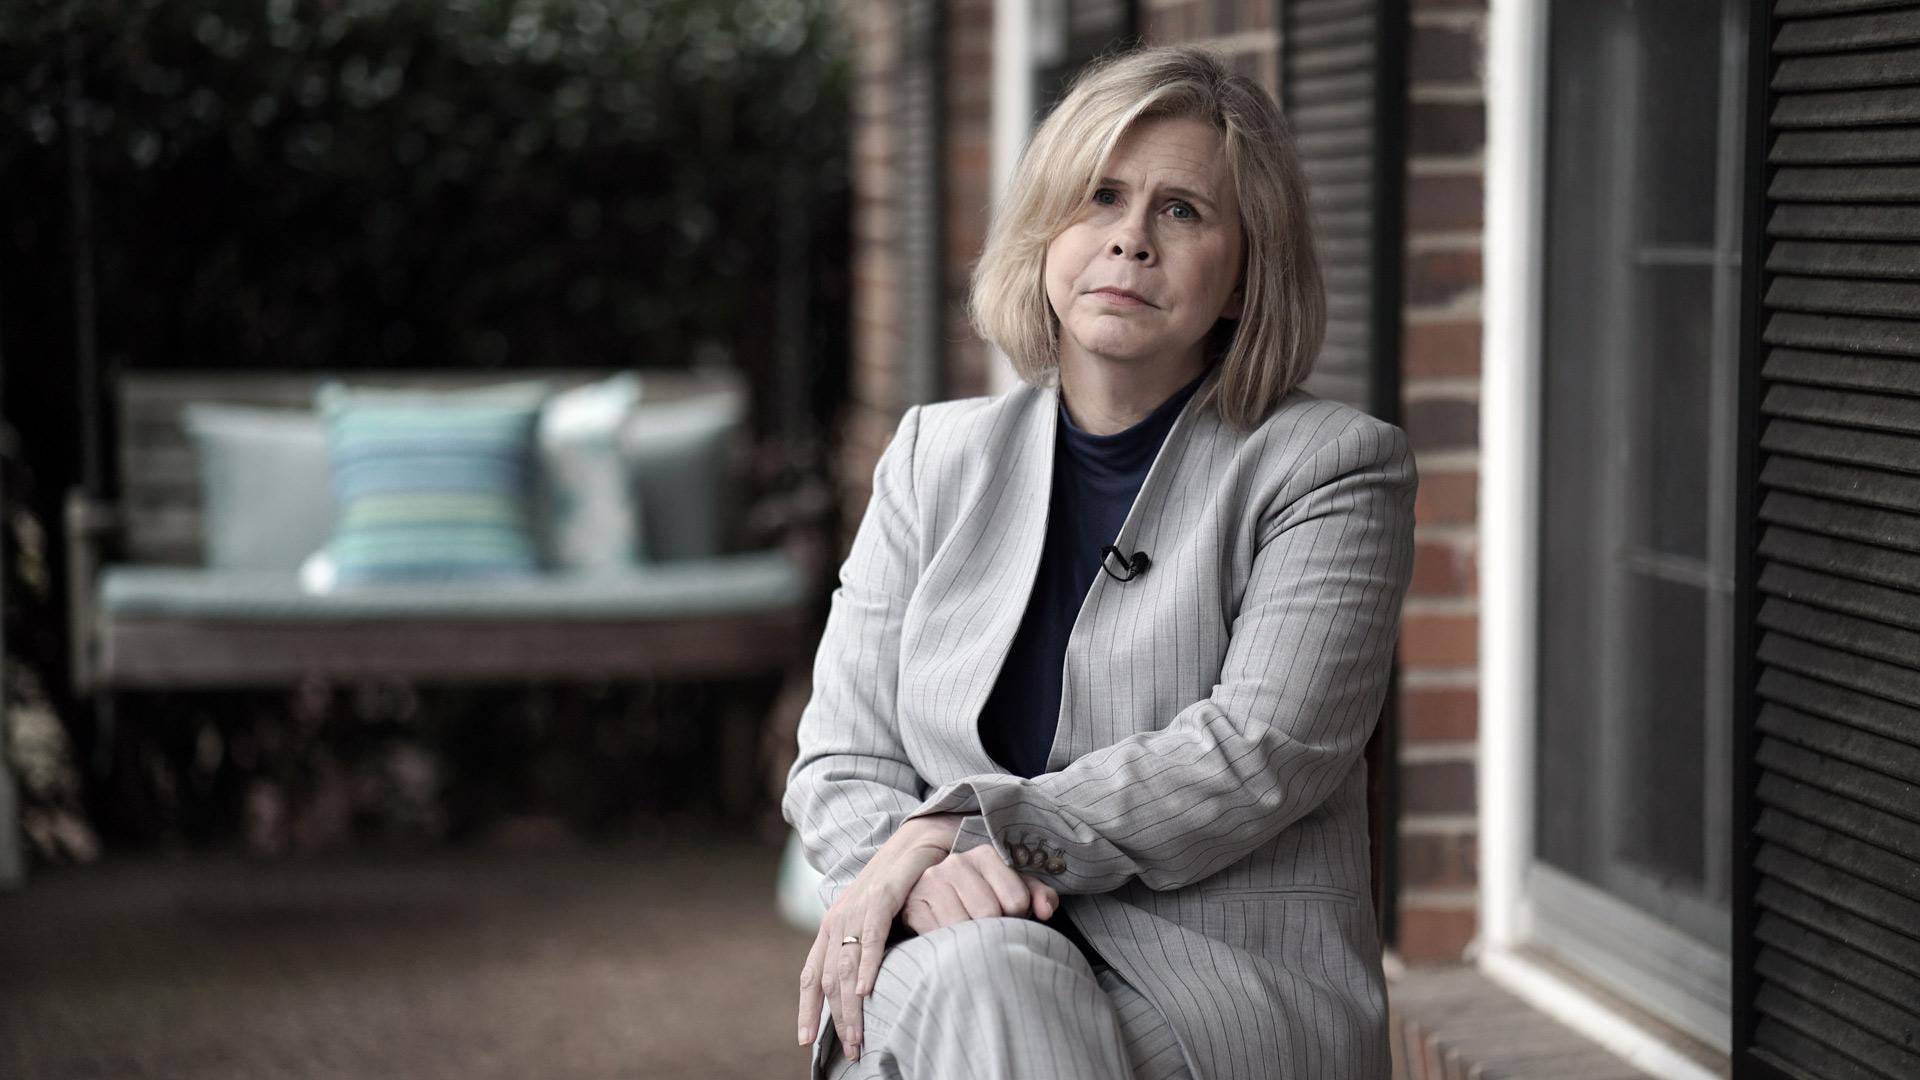 Kelley Henry, Lisa Montgomery's lawyer